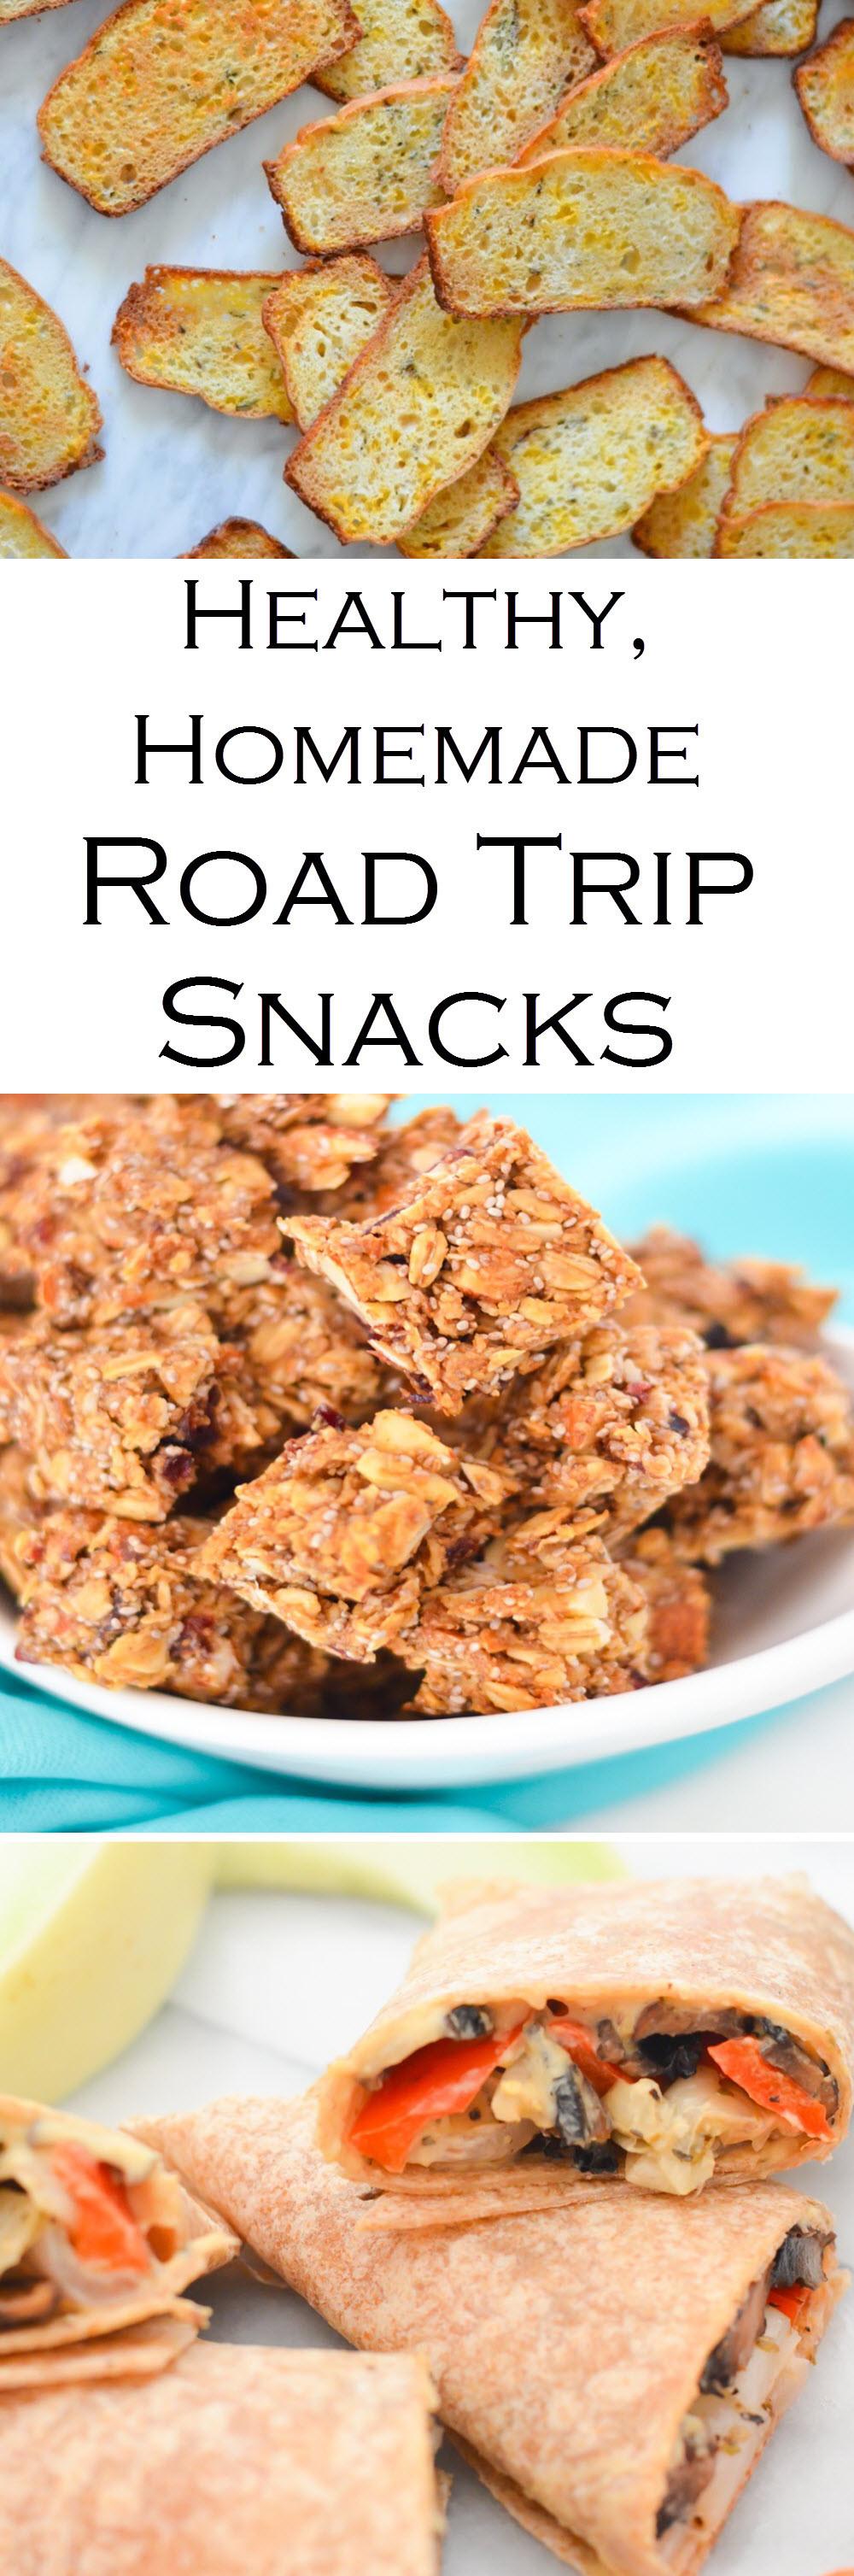 Road Trip Snacks Healthy  Healthy Homemade Road Trip Snacks